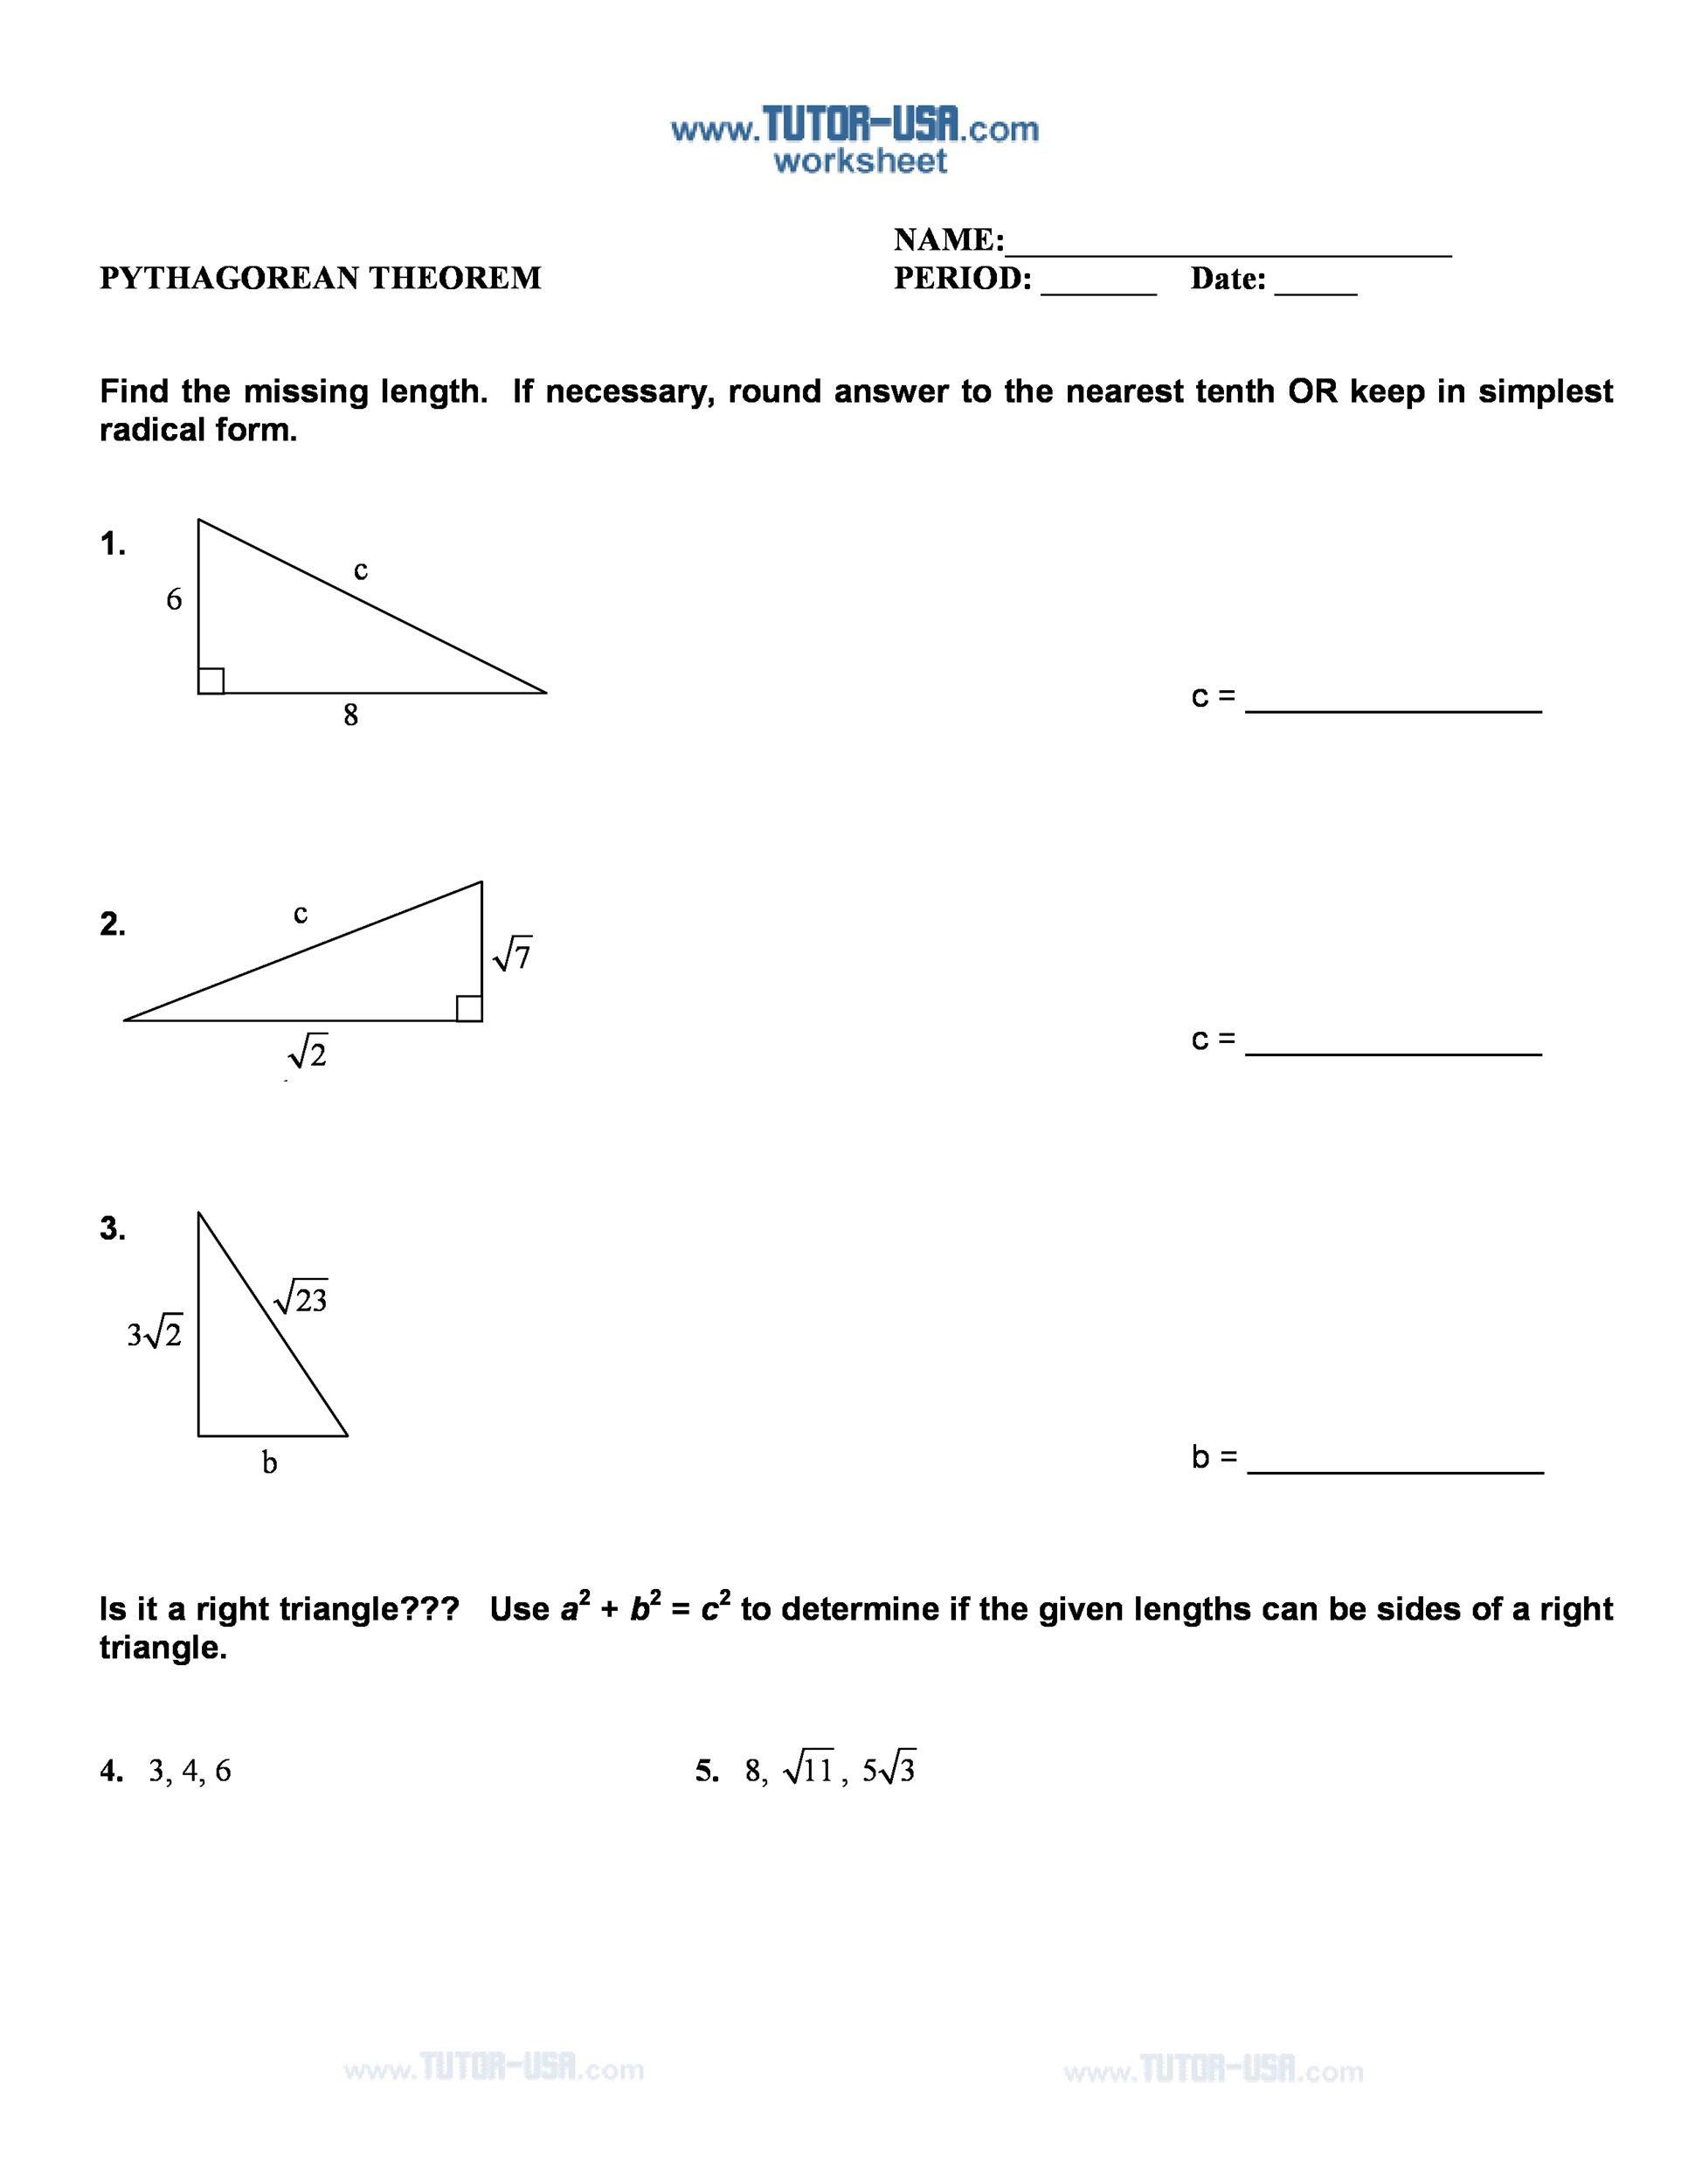 Pythagoras theorem Worksheet with Answers Worksheets Pythagorean theorem formula